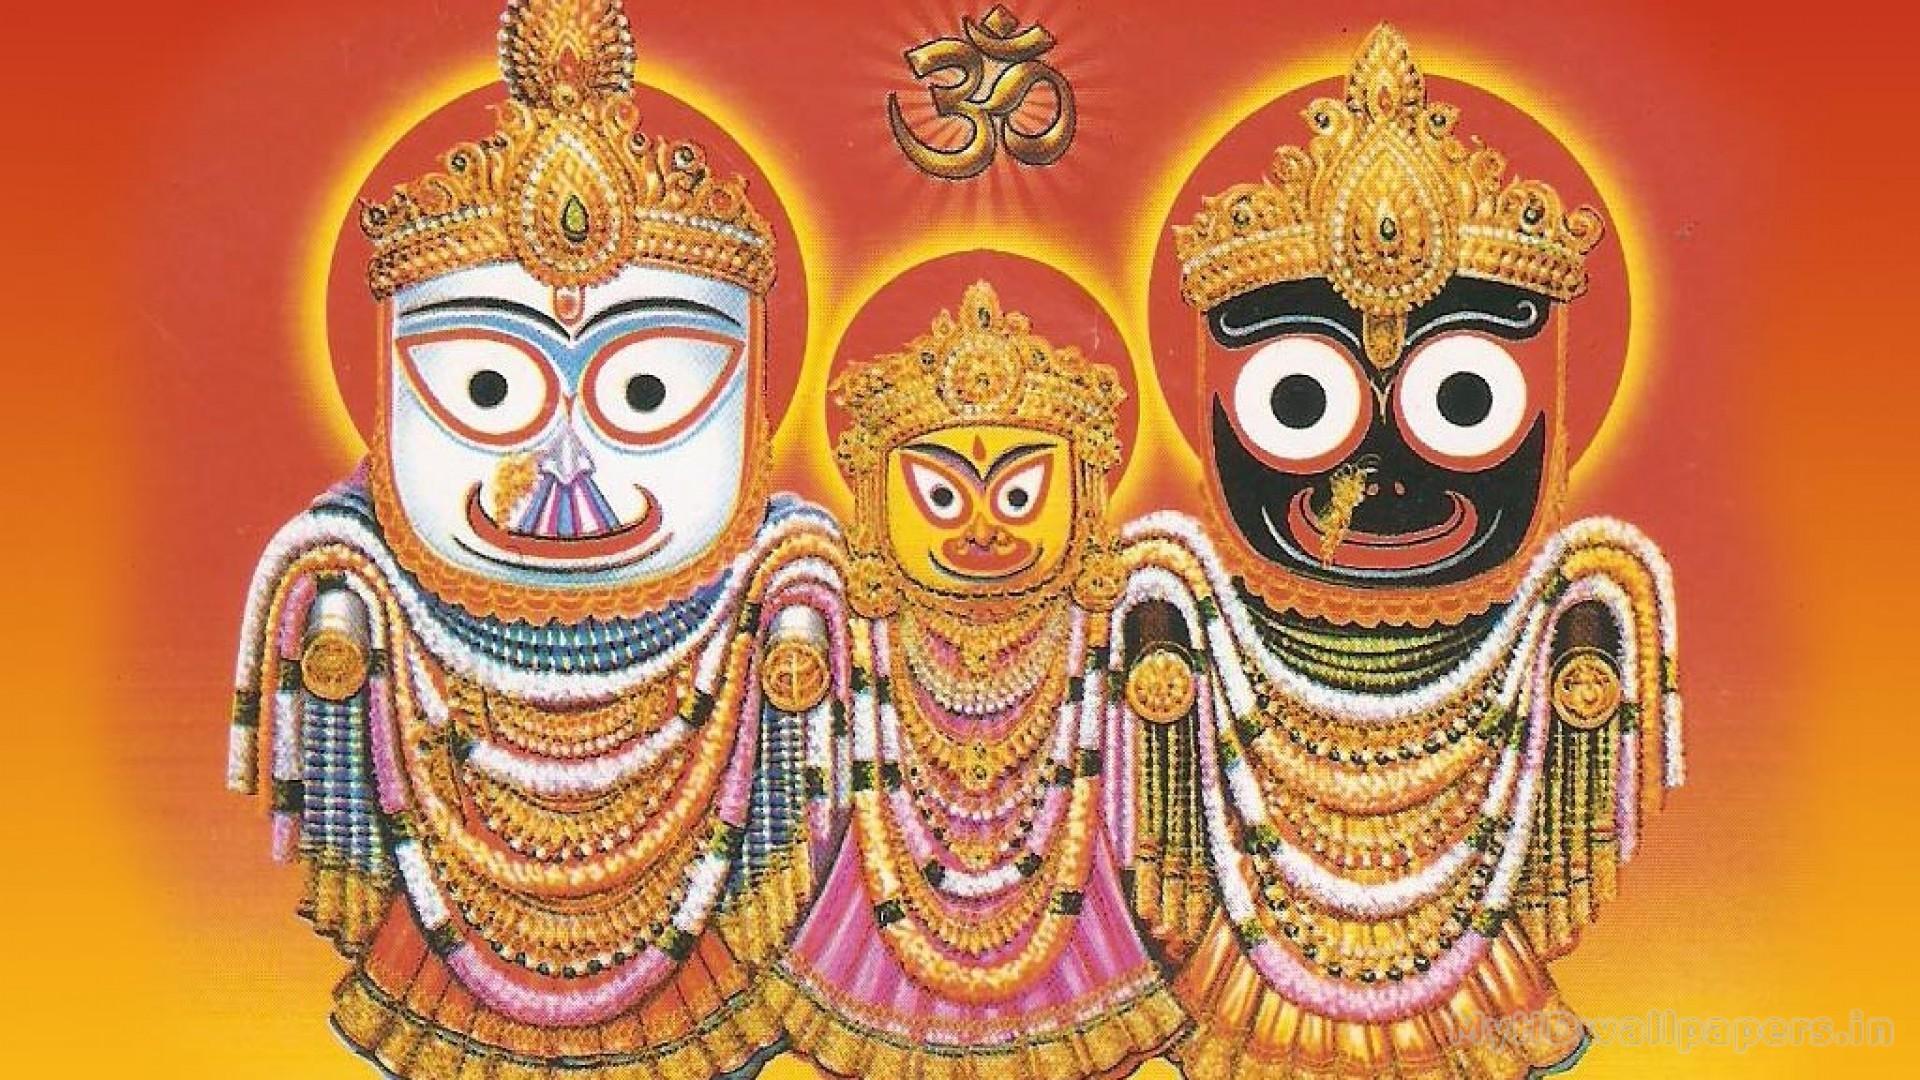 Hindu God Wallpaper Hd – Wallpapers HD Fine